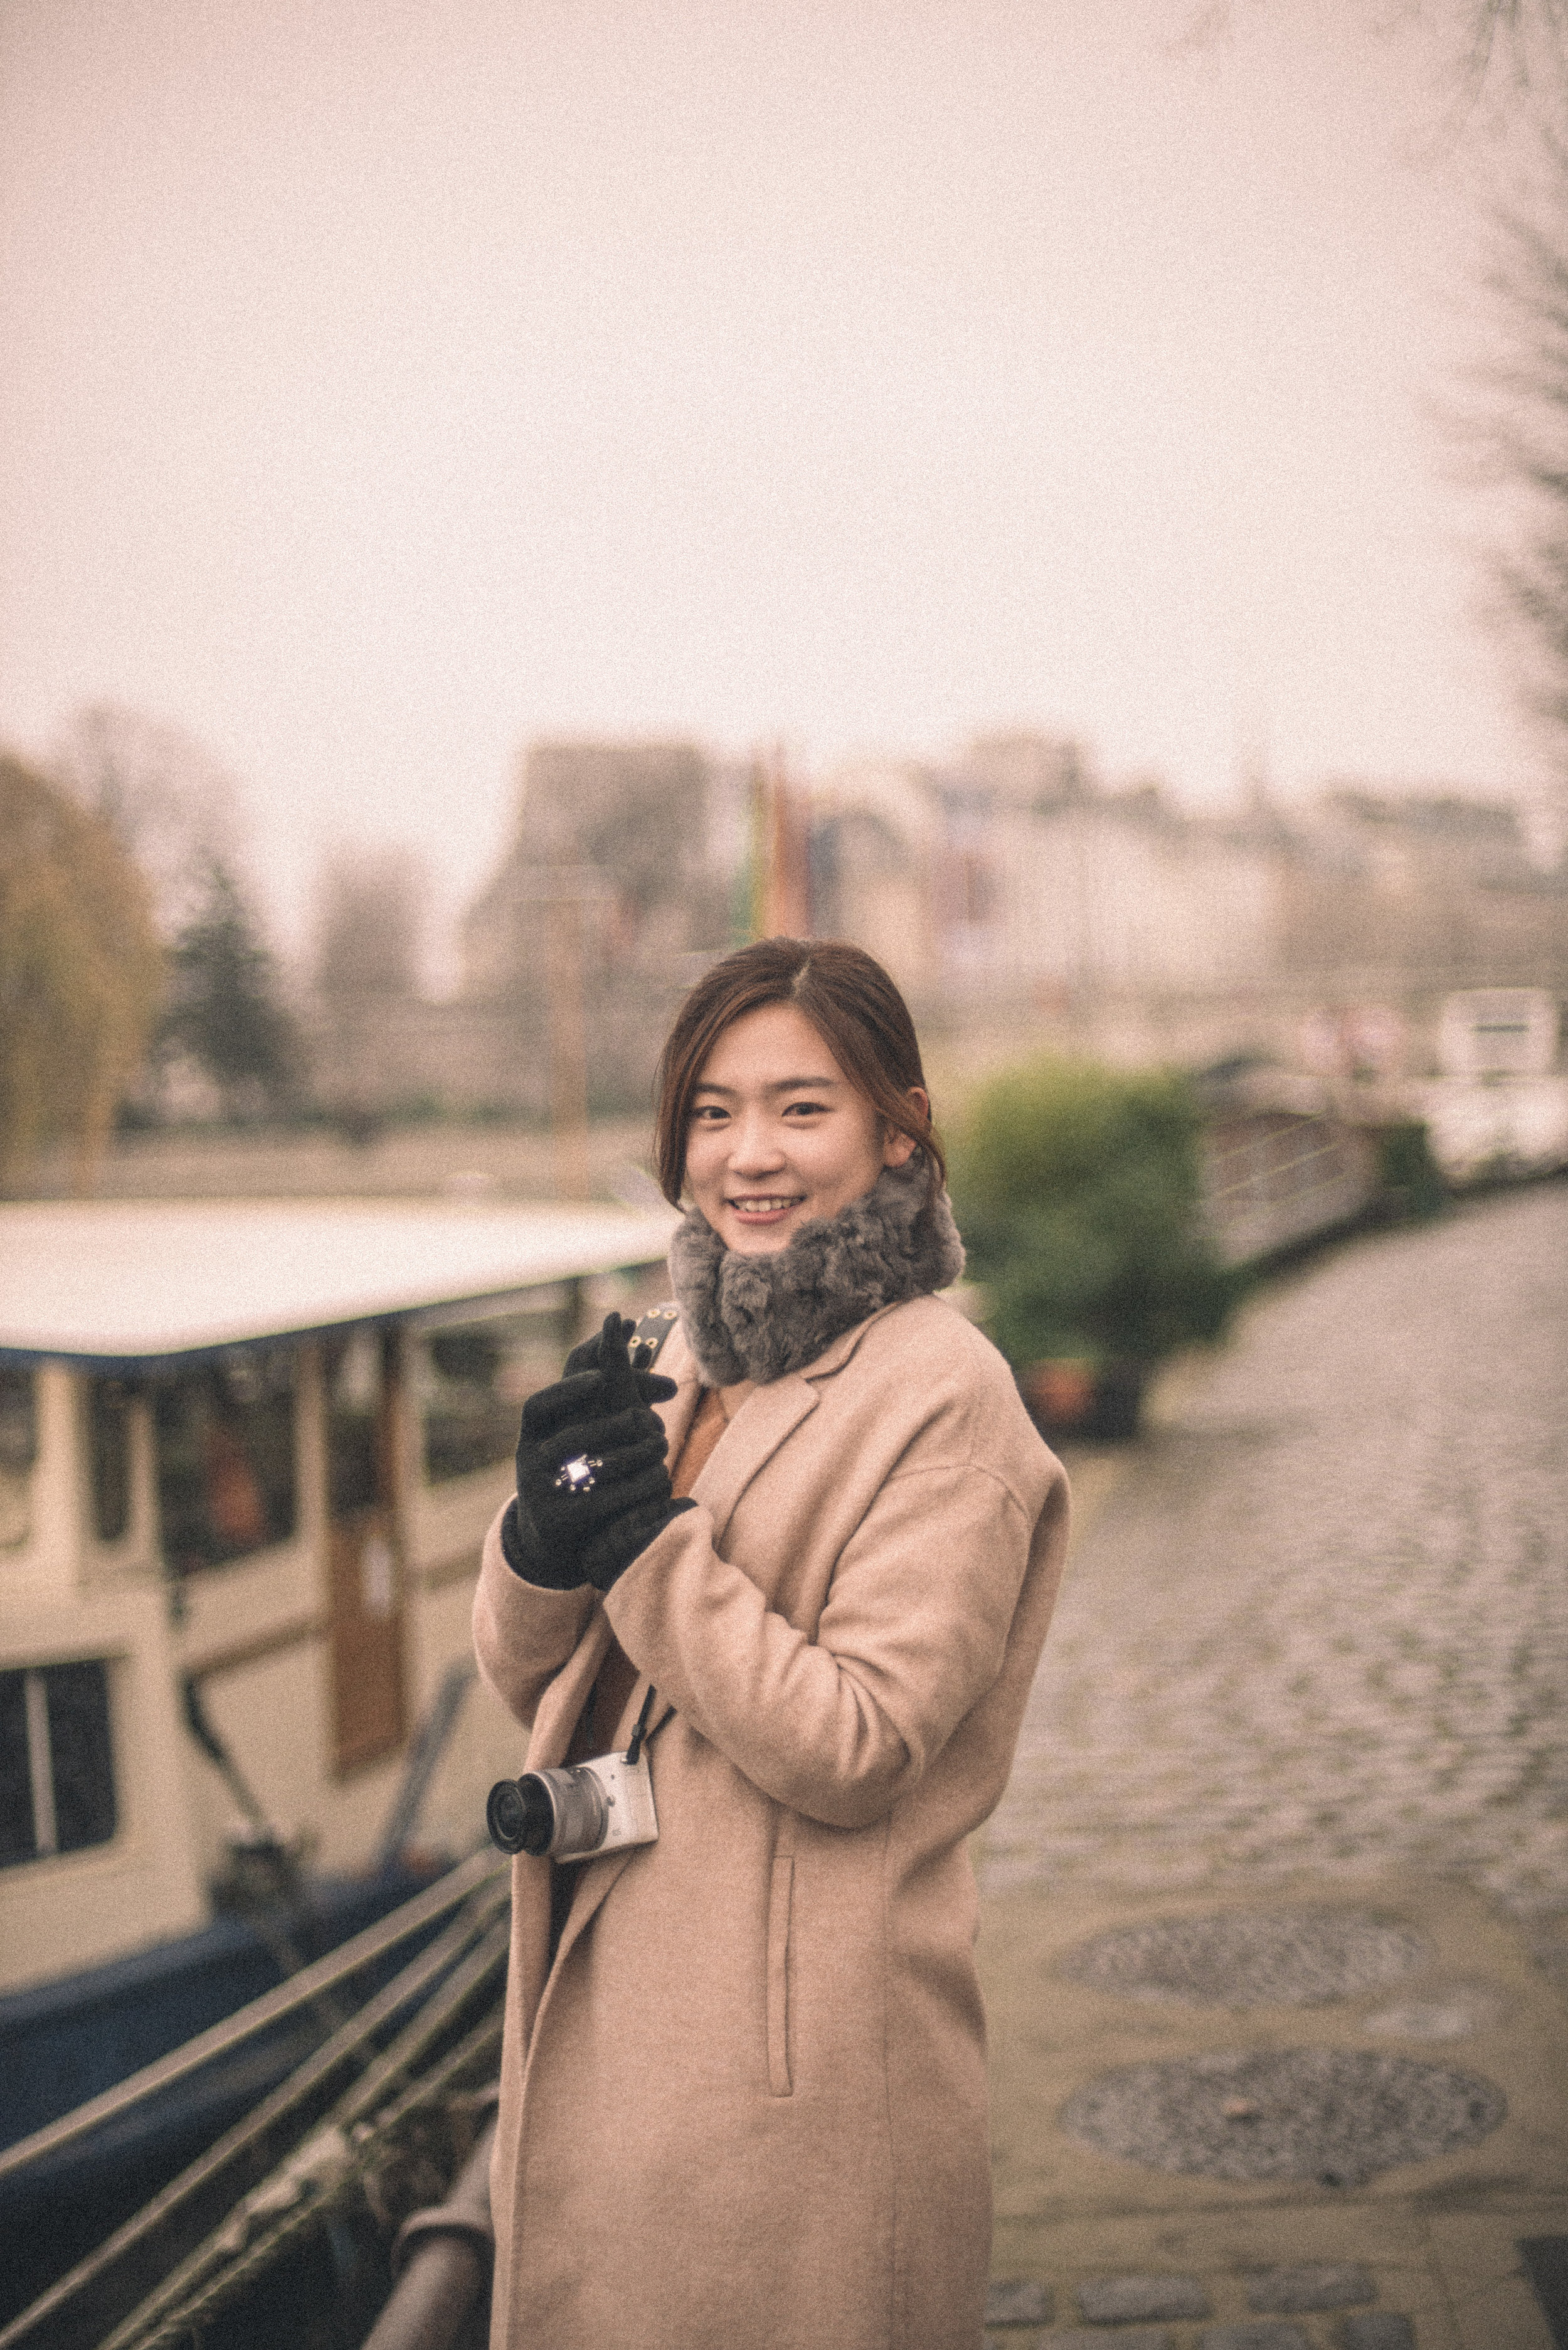 Sprazzi_Professional_Photography_Paris_Taehun36.jpg